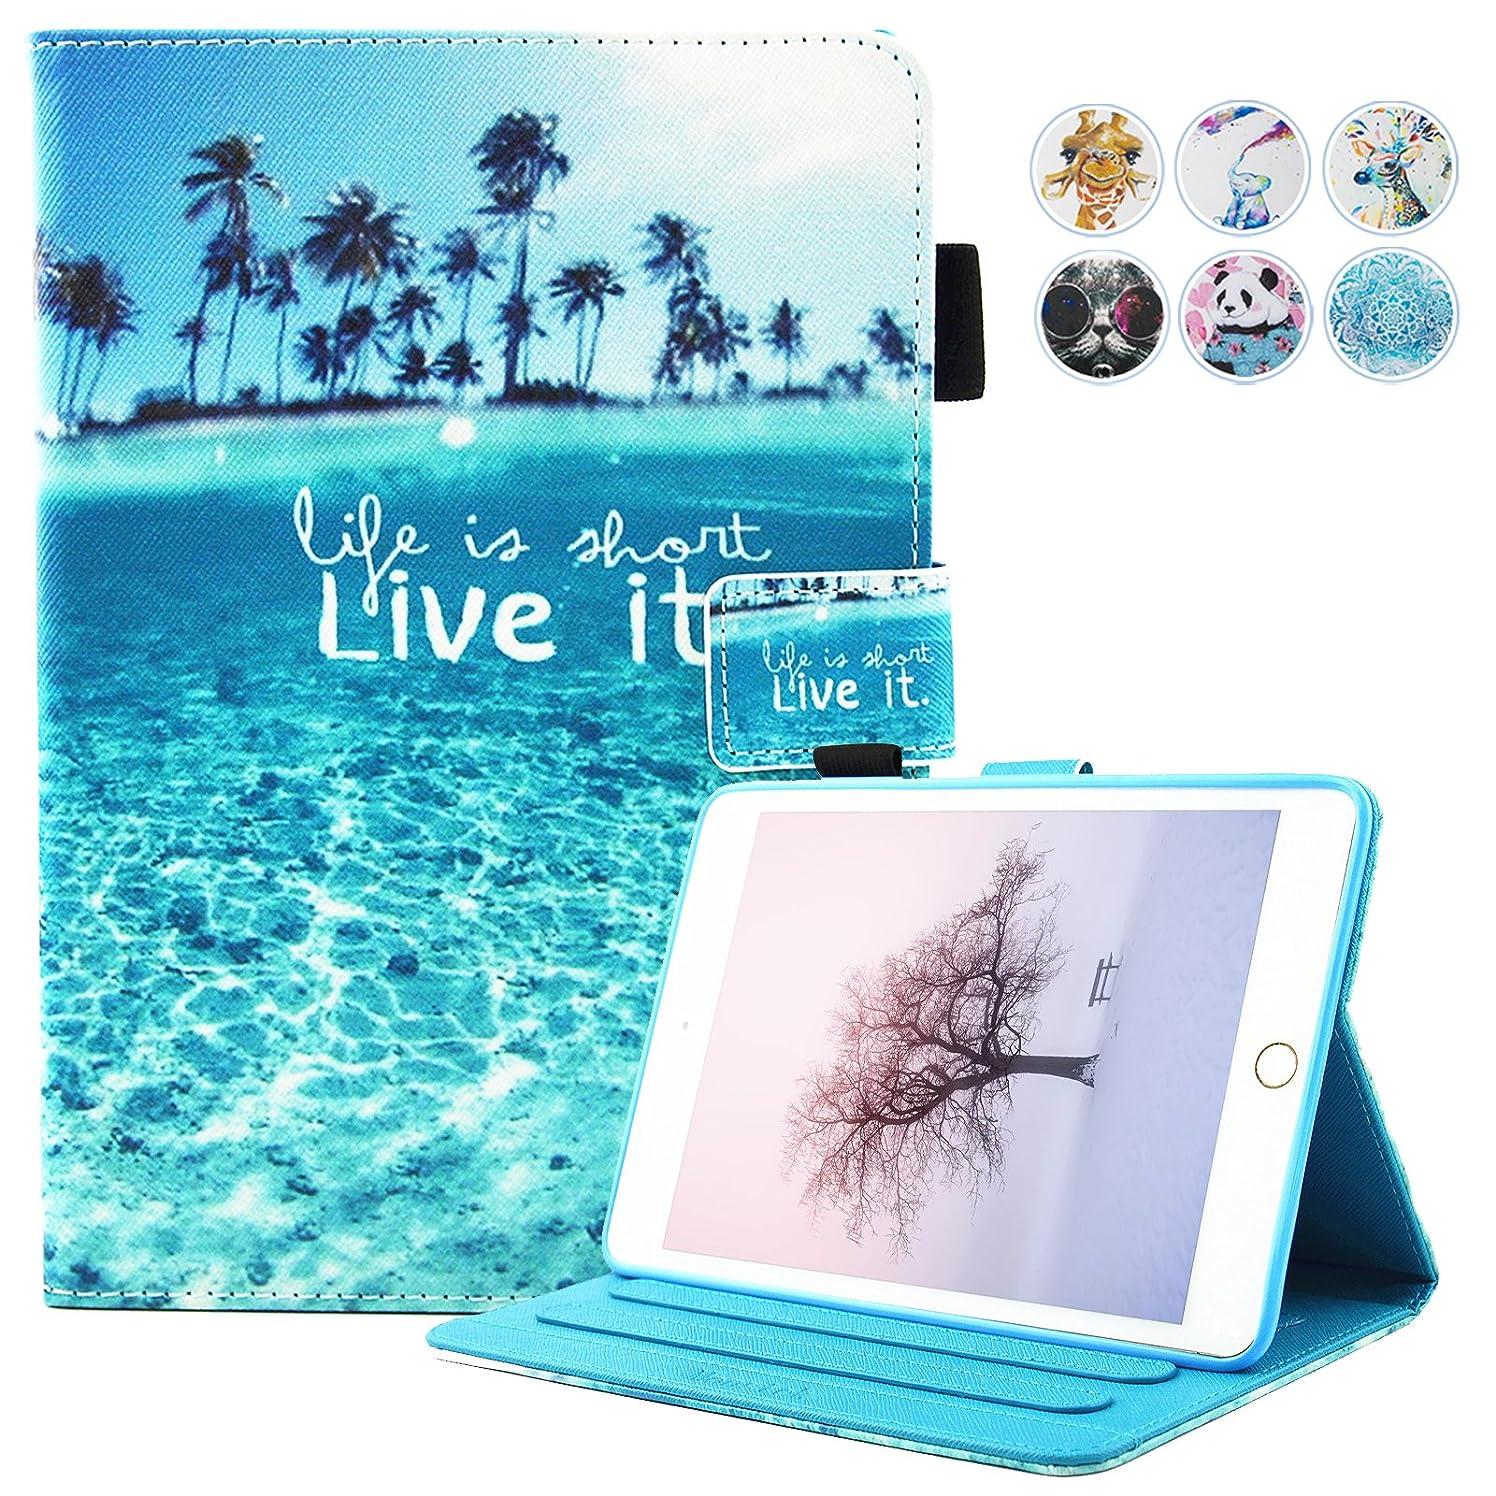 iPad Mini Case,Mini 2/3 Case Monstek(TM) Leather Smart Kickstand Case Cover Colorful Flip Wallet Protective Case for Apple iPad Mini 1 2 3 - 01 Beach